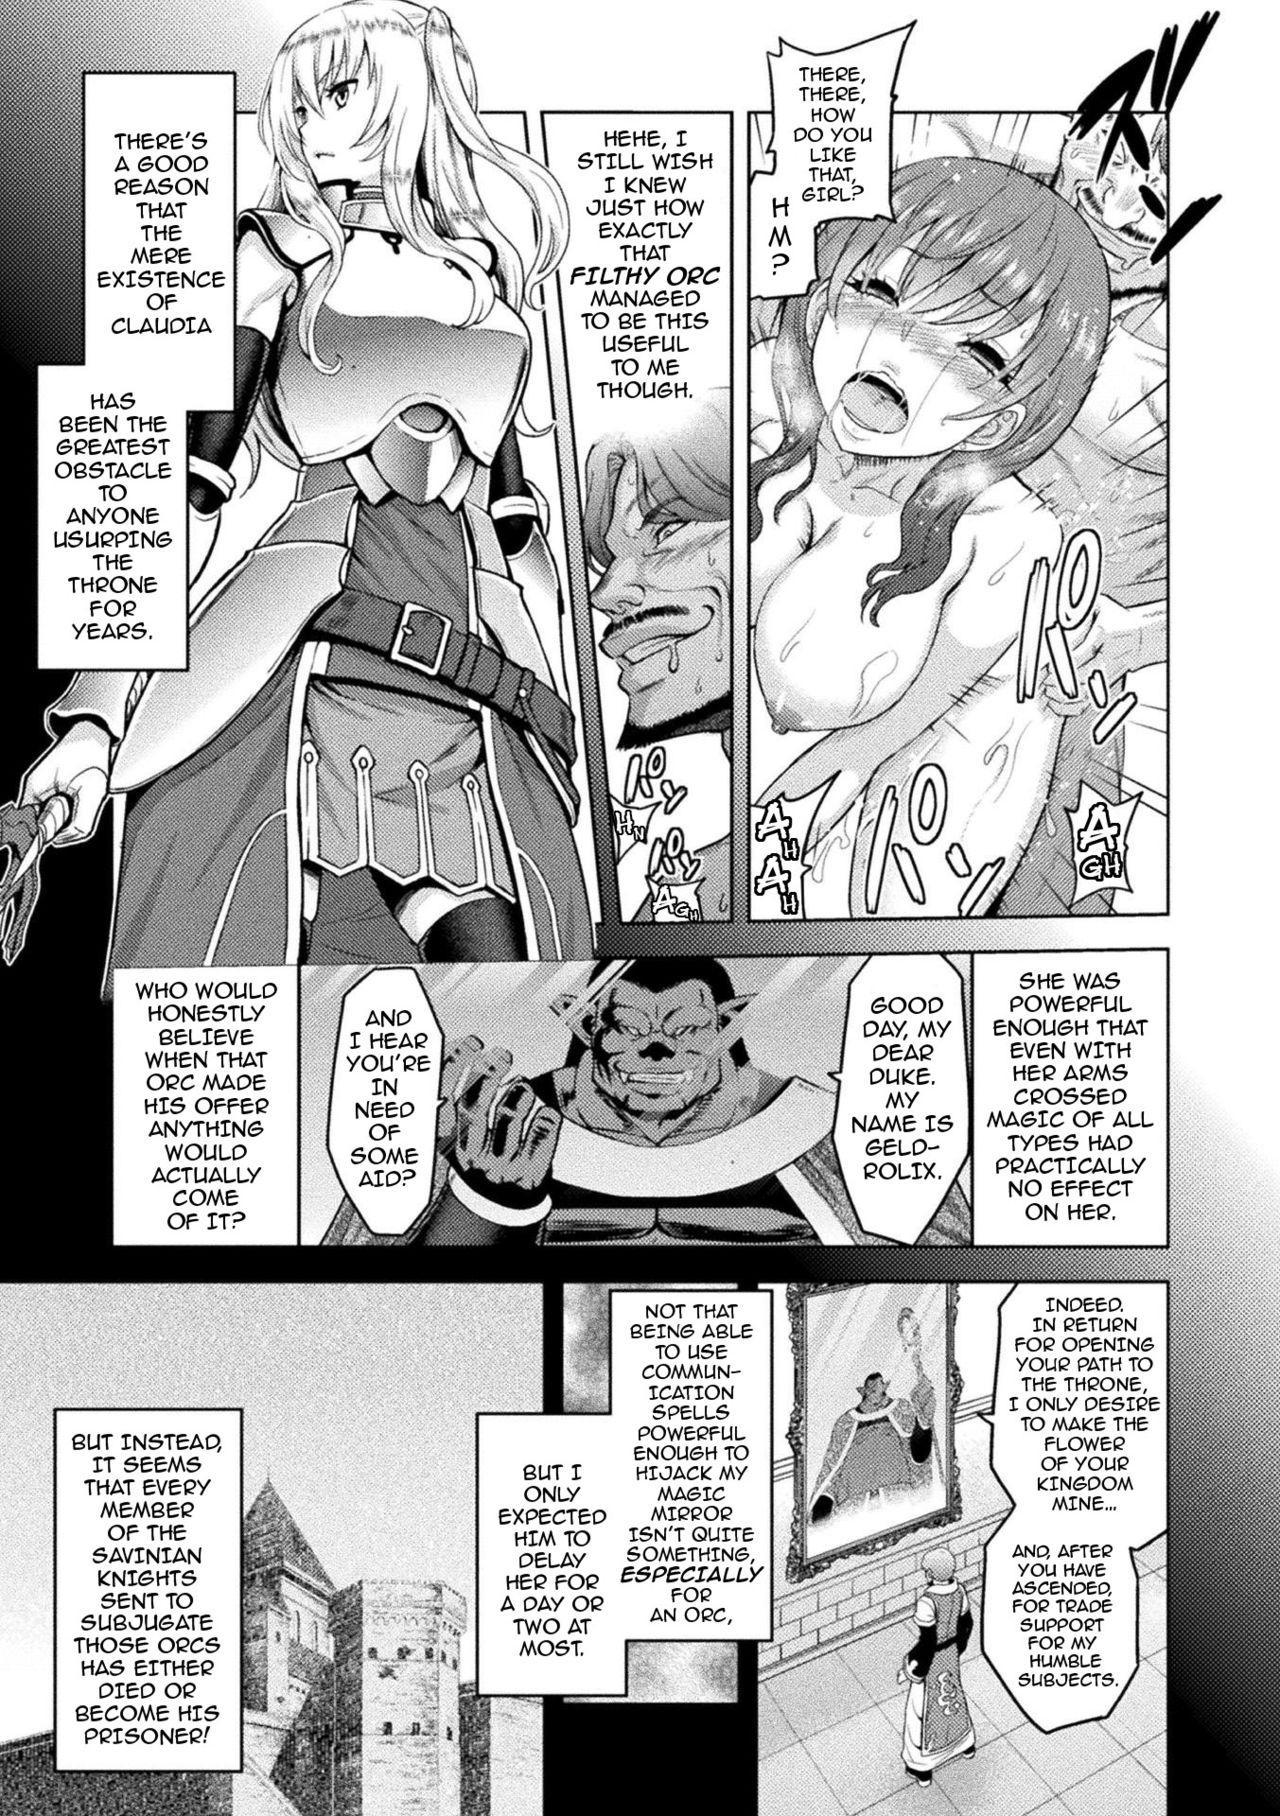 [Yamada Gogogo] Erona ~Orc no Inmon ni Okasareta Onna Kishi no Matsuro~ | Erona ~The Fall of a Beautiful Knight Cursed with the Lewd Mark of an Orc~ Ch. 1-5 [English] {darknight} 77